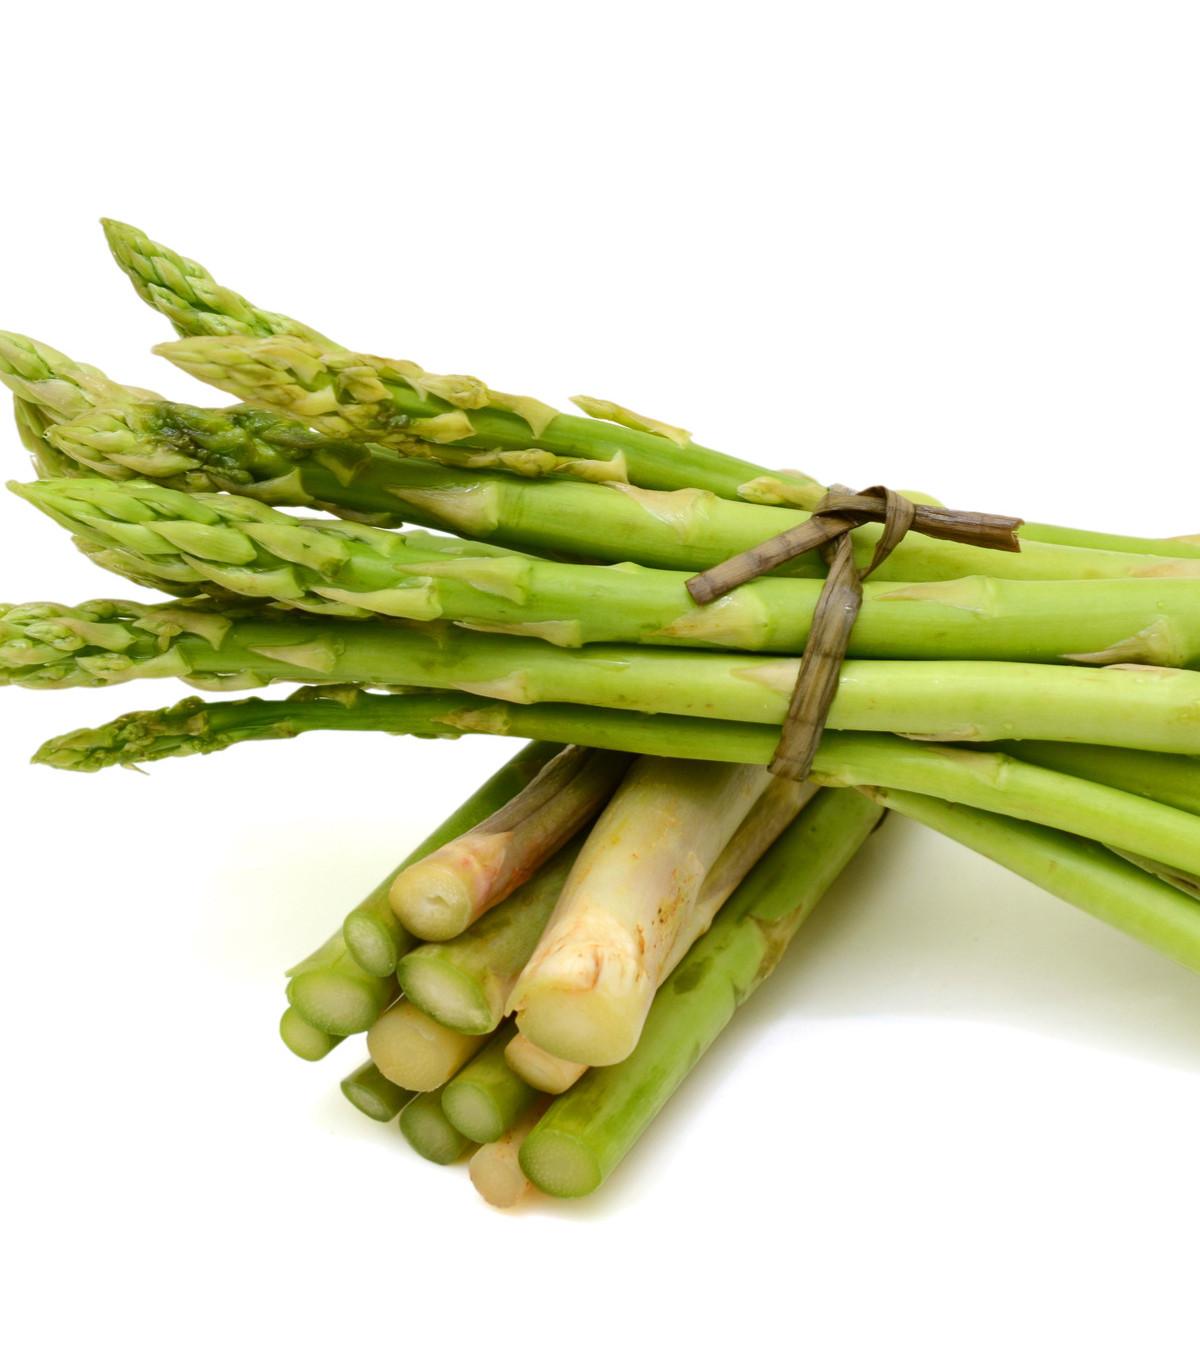 Chřest lékařský Mary Washington - Asparagus officinalis - semena chřestu - 35 ks